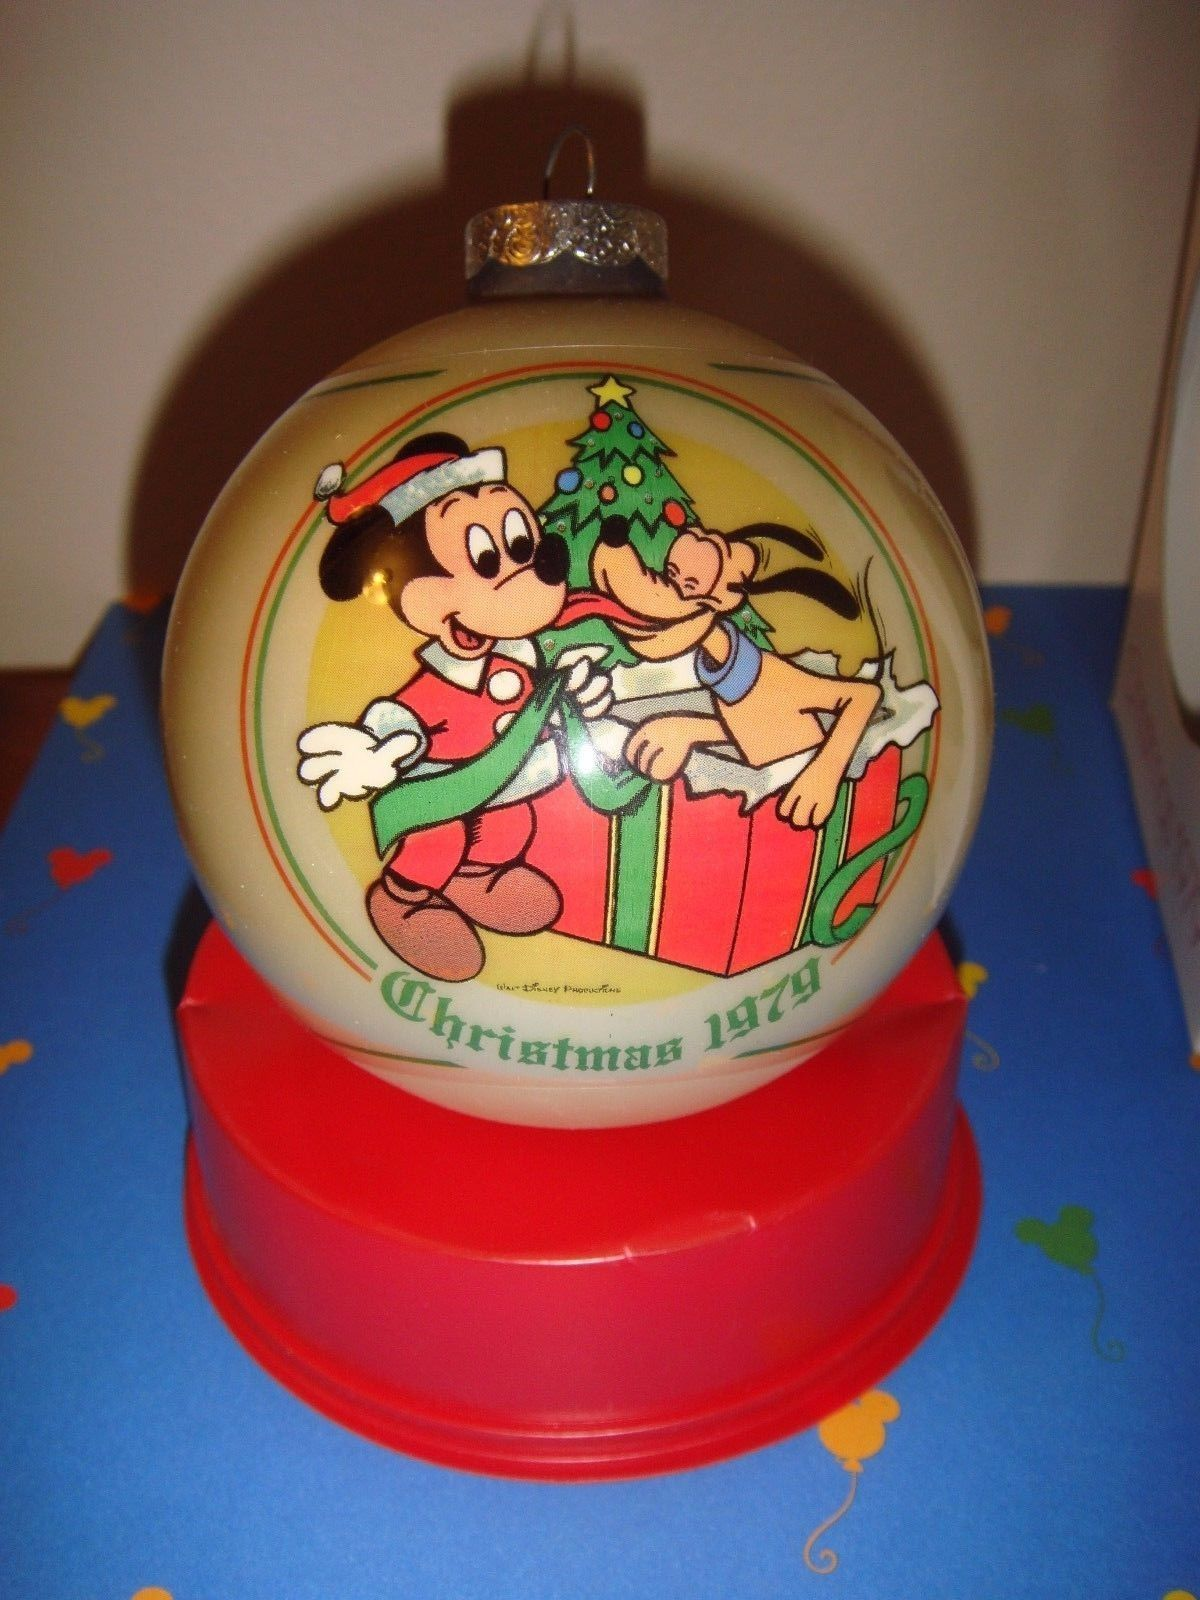 Schmid 1979 Walt Disney Christmas Ornament 6th In Series